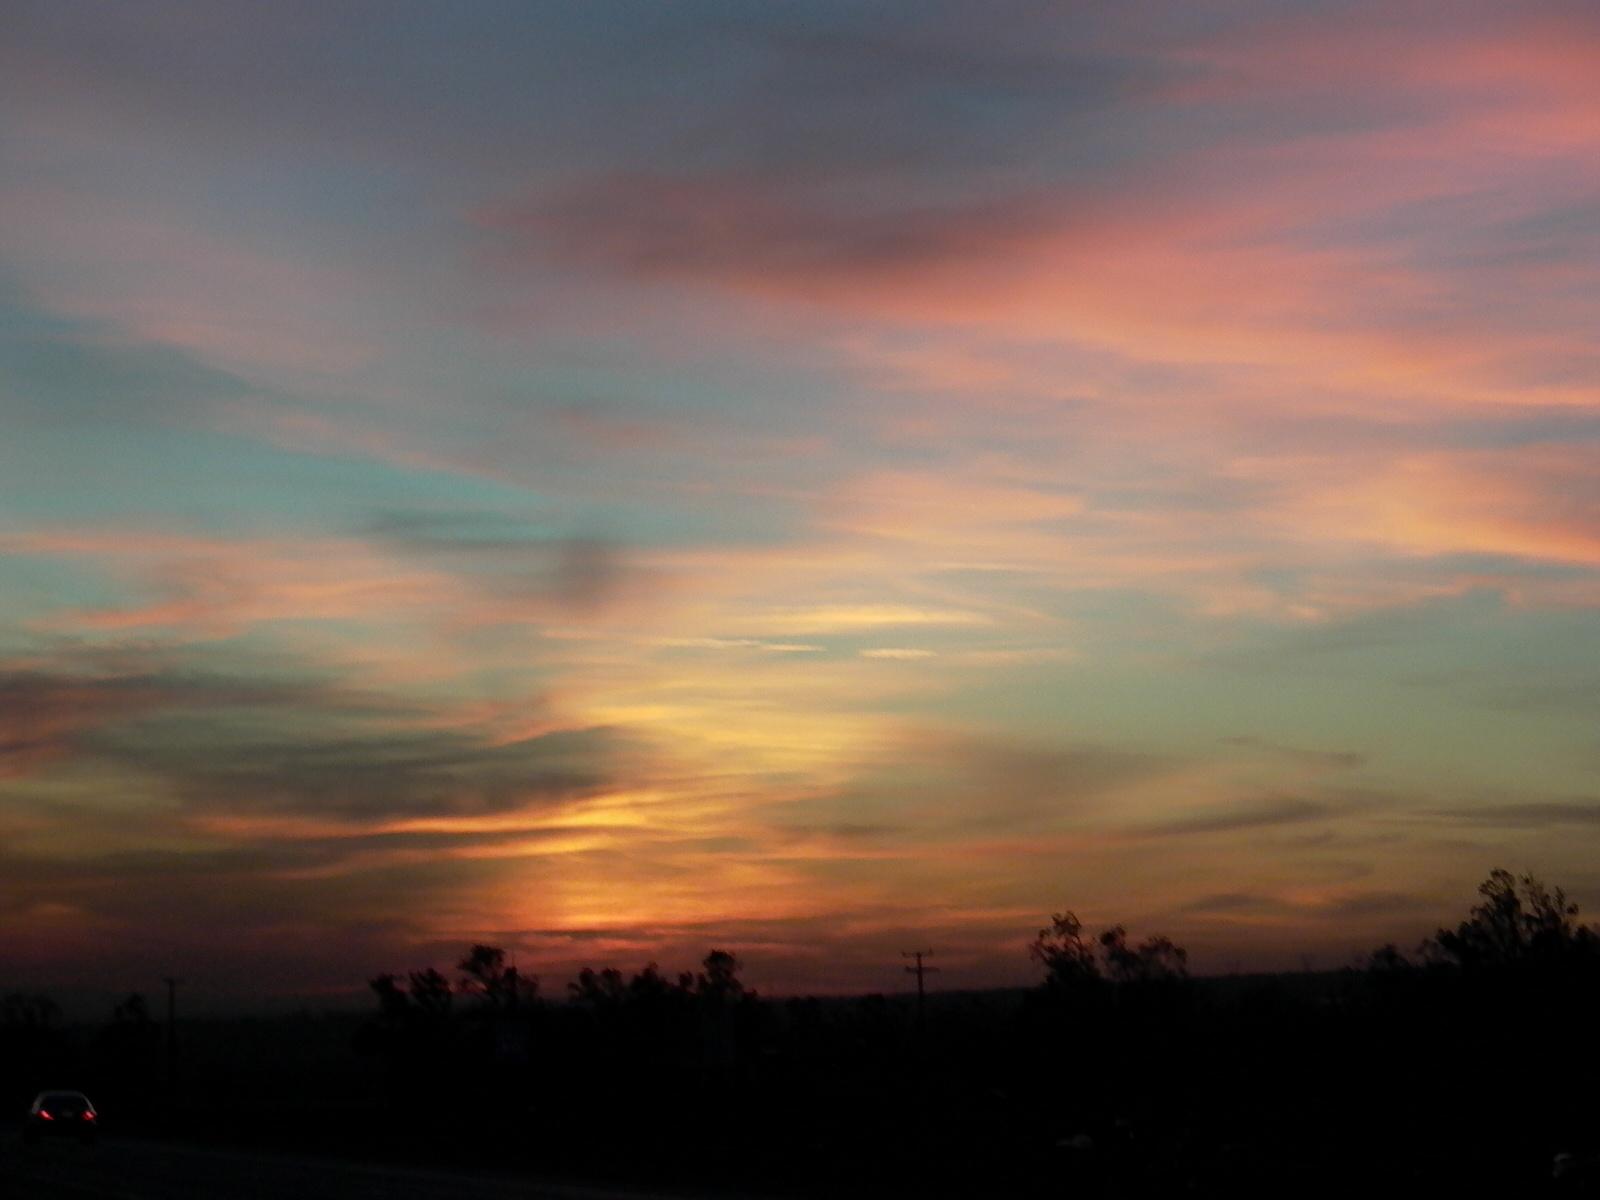 (Light): sunset clouds pink yellow blue sky MY.jpg. D=2003-04-14 [Apr 14, 2003]; S=414kB, 1600x1200; T=JPEG image [MIME:image/jpeg].